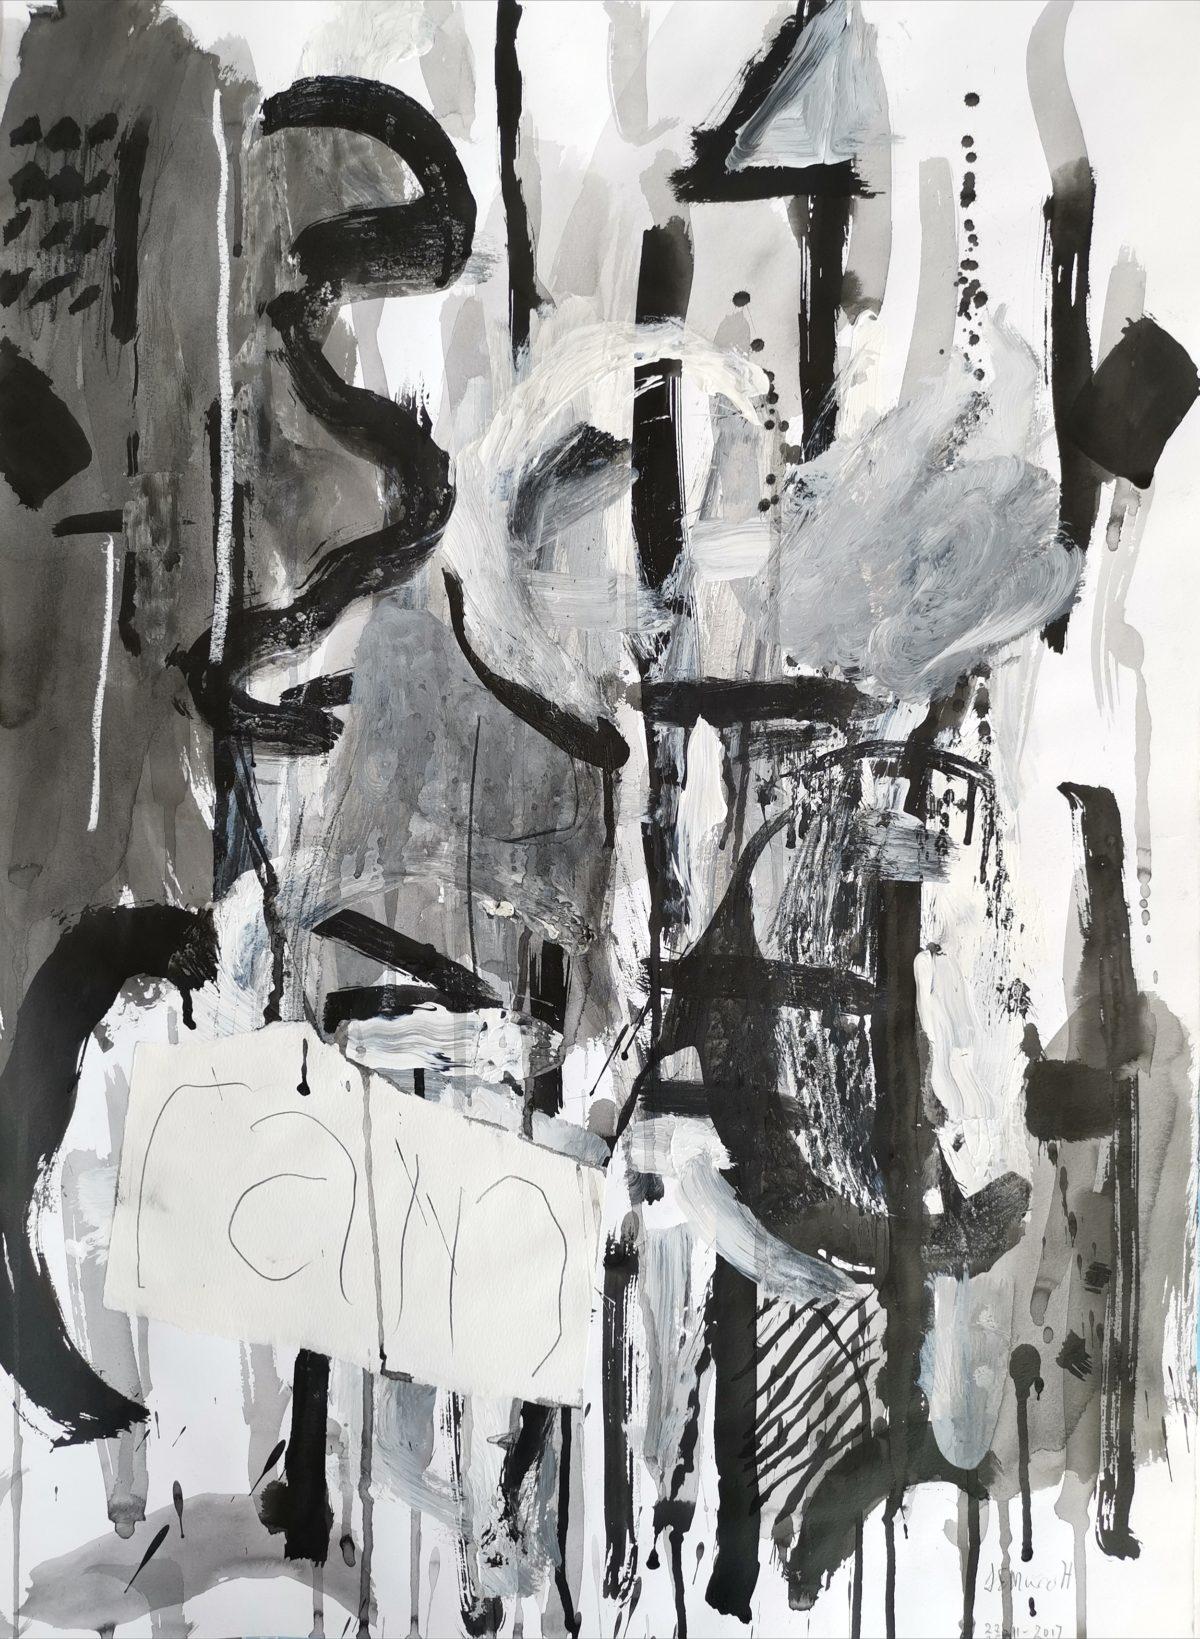 Lionel Murcott - Mixed Media on Fabriano - 70 x 50 cm